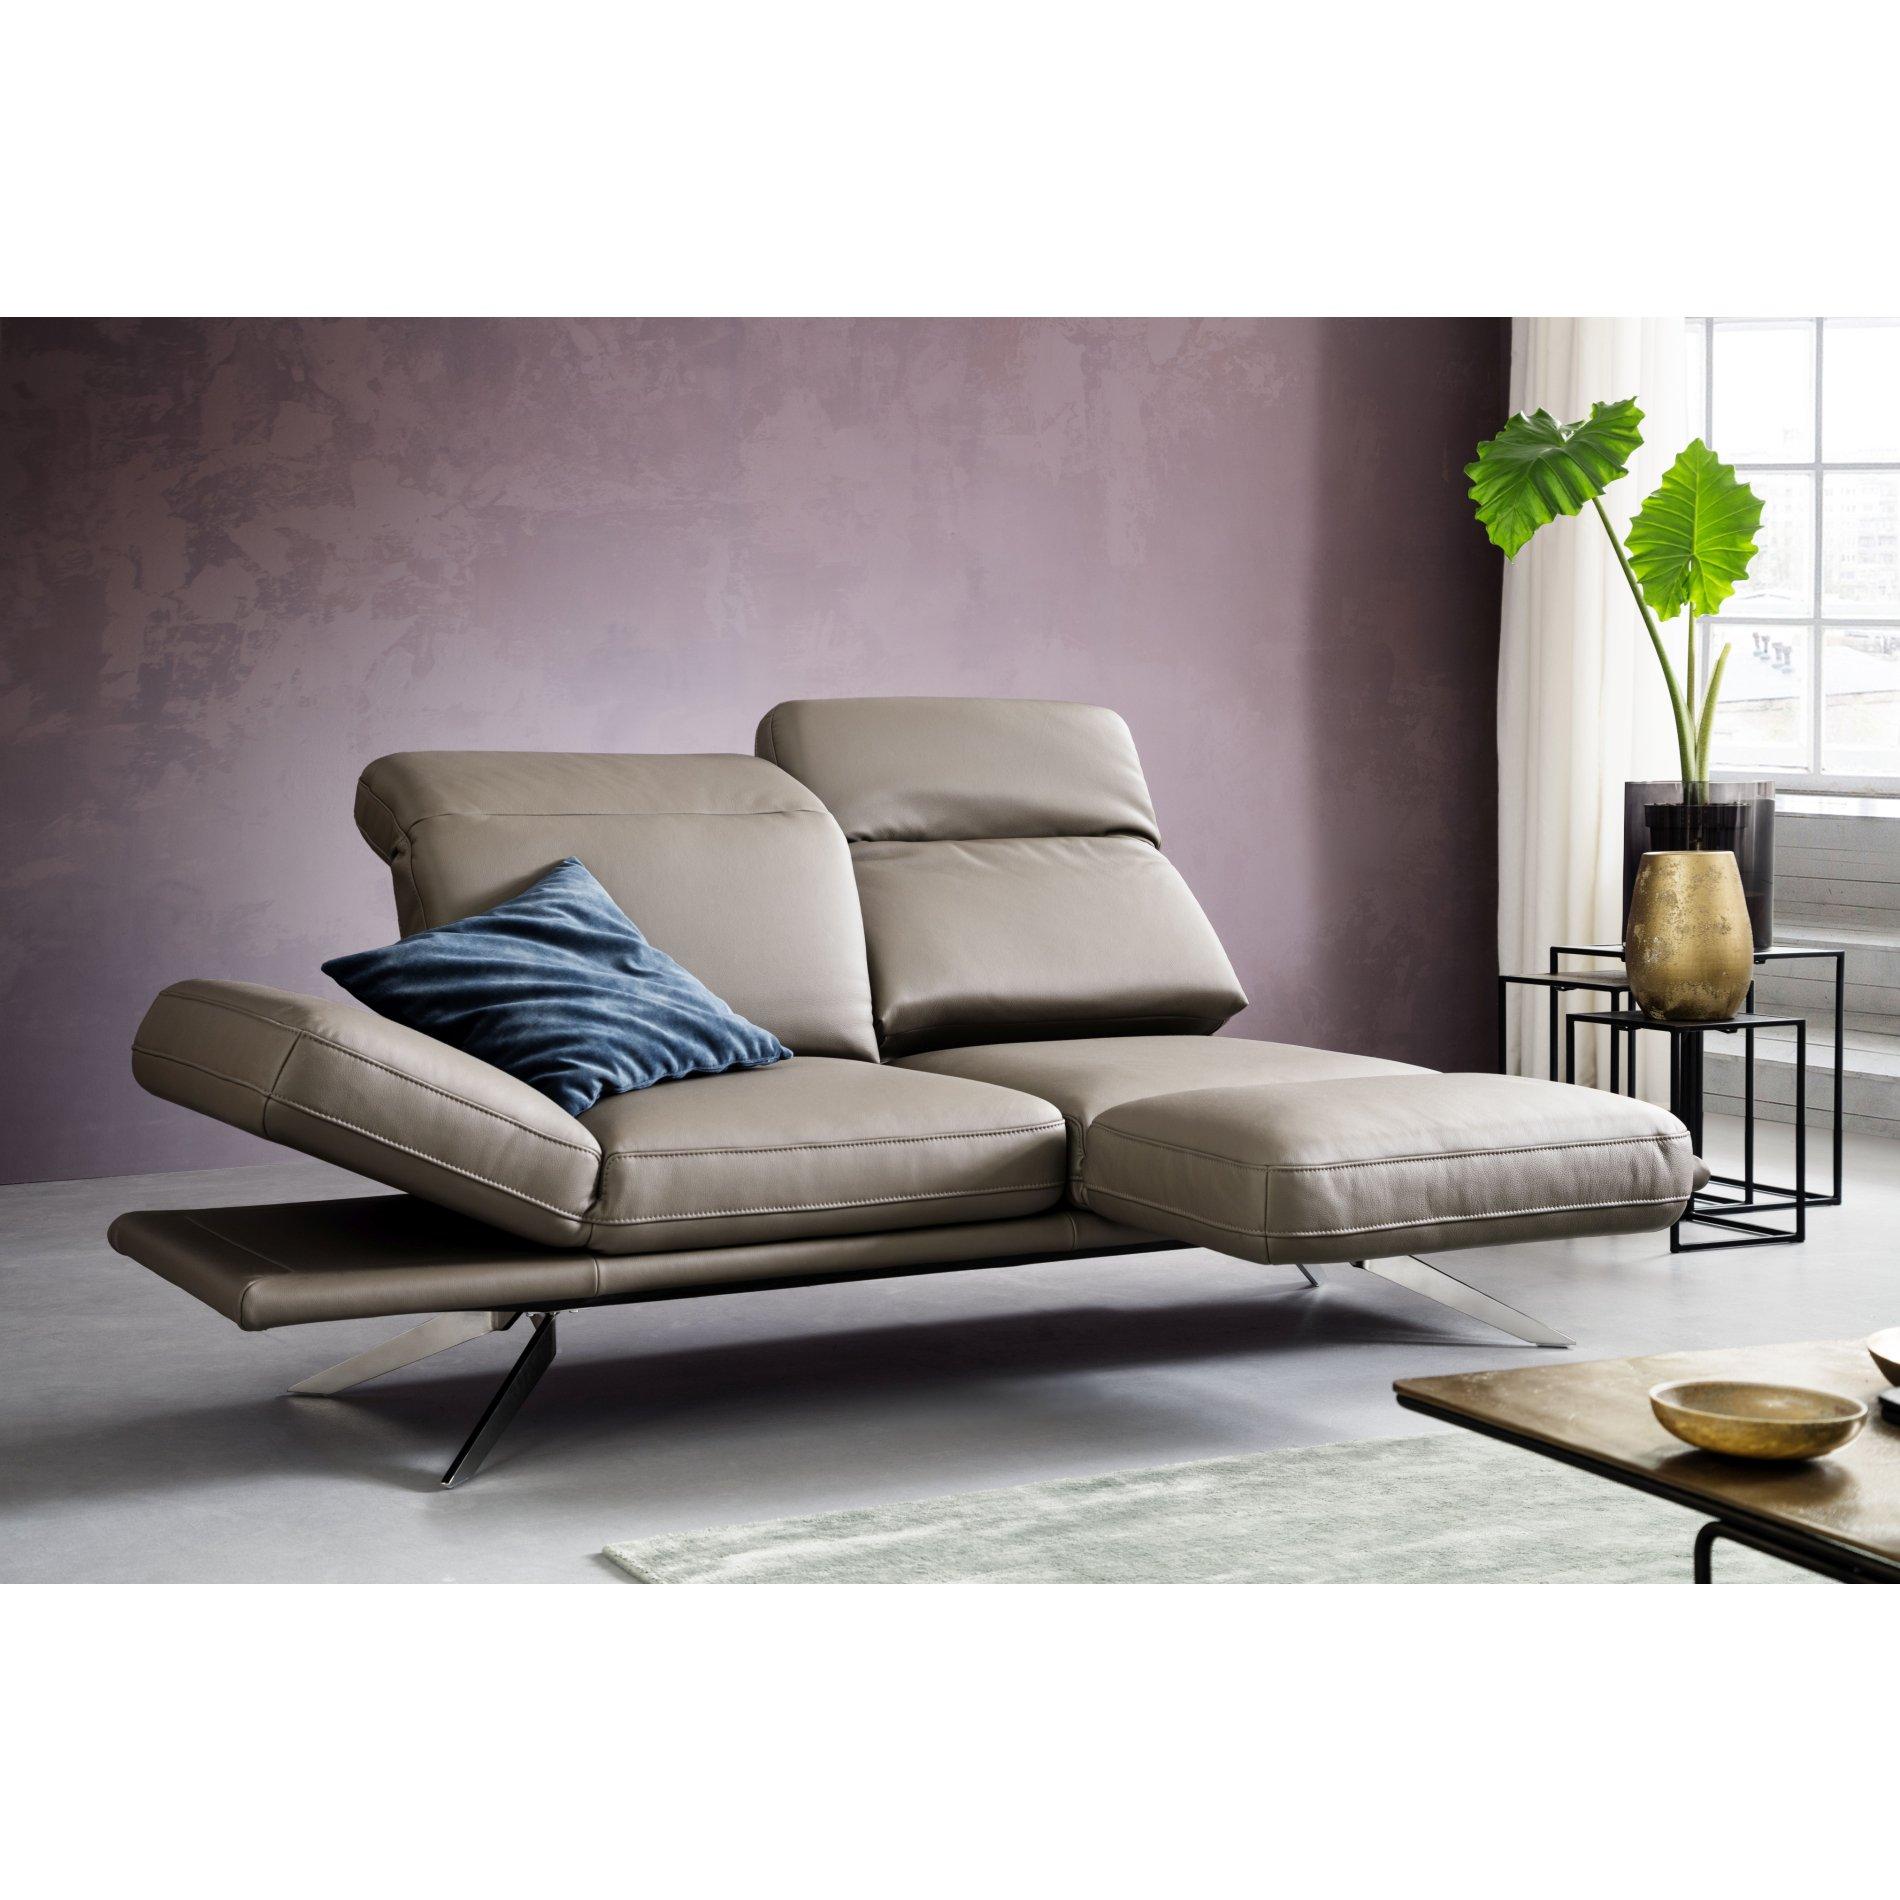 Full Size of 2 5 Sitzer Sofa Mit Relaxfunktion Leder Grau Couch Microfaser Comfort Republic Sophie Ebay Betten 180x200 Recamiere Sofort Lieferbar Rolf Benz Kunstleder Sofa Sofa 2 5 Sitzer